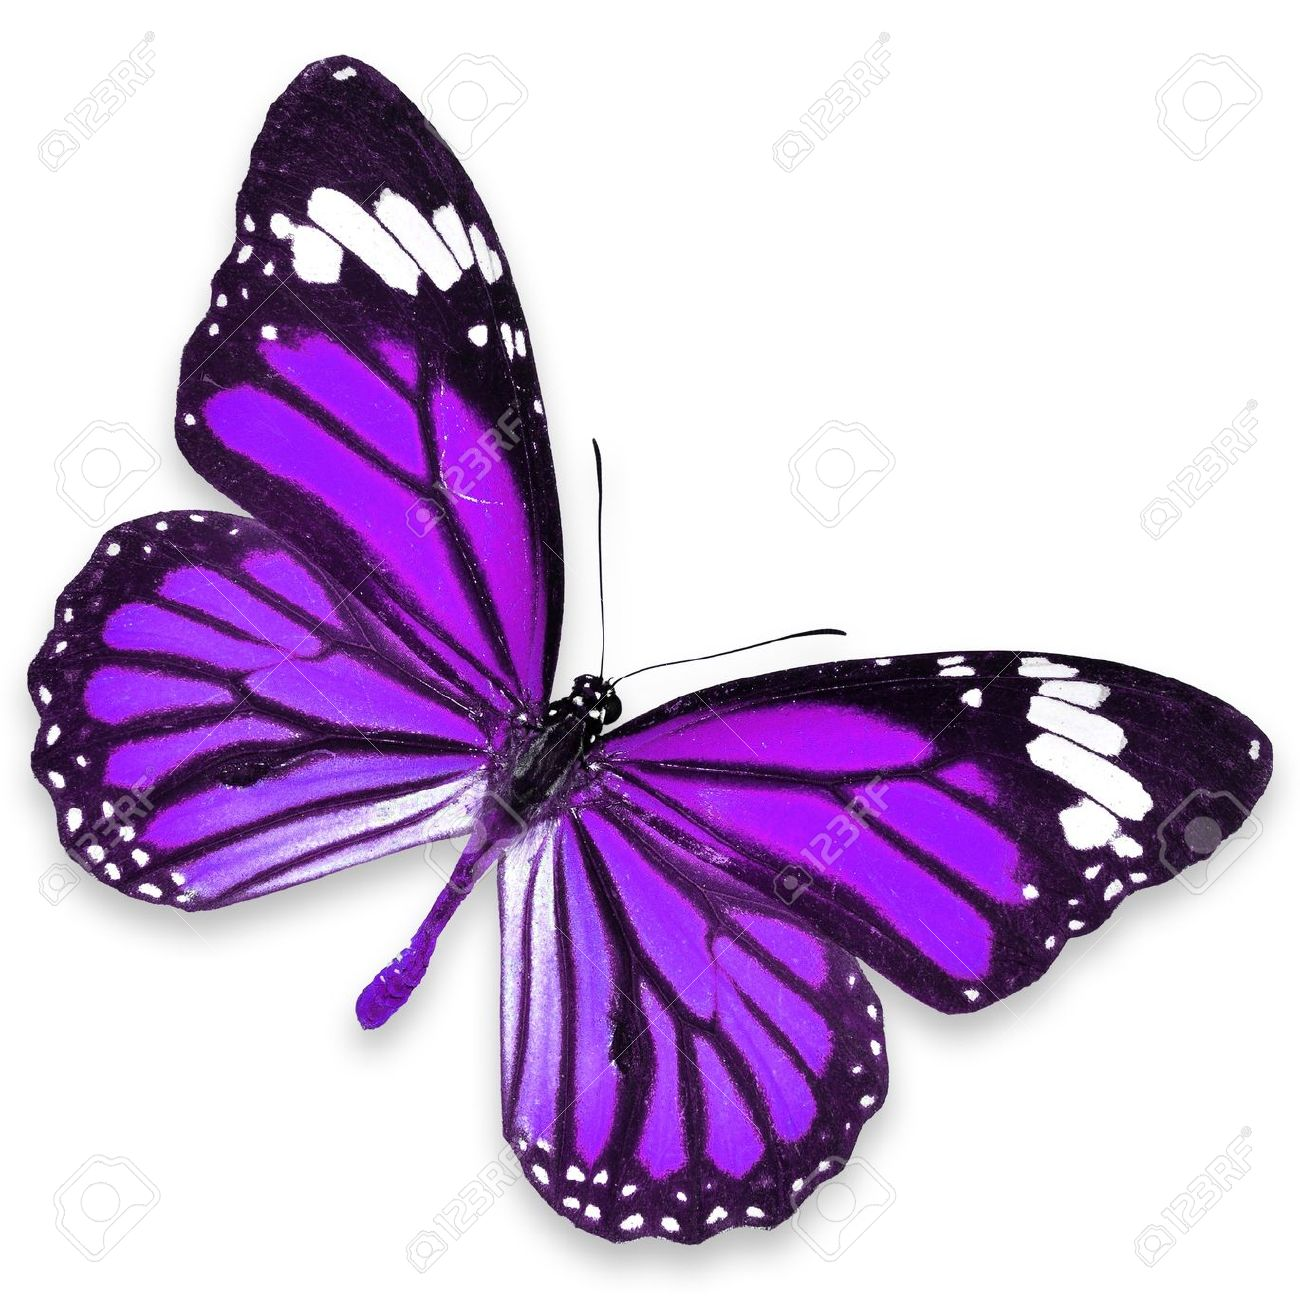 Gambar kupu kupu lengkap gambar foto - Images de papillon ...